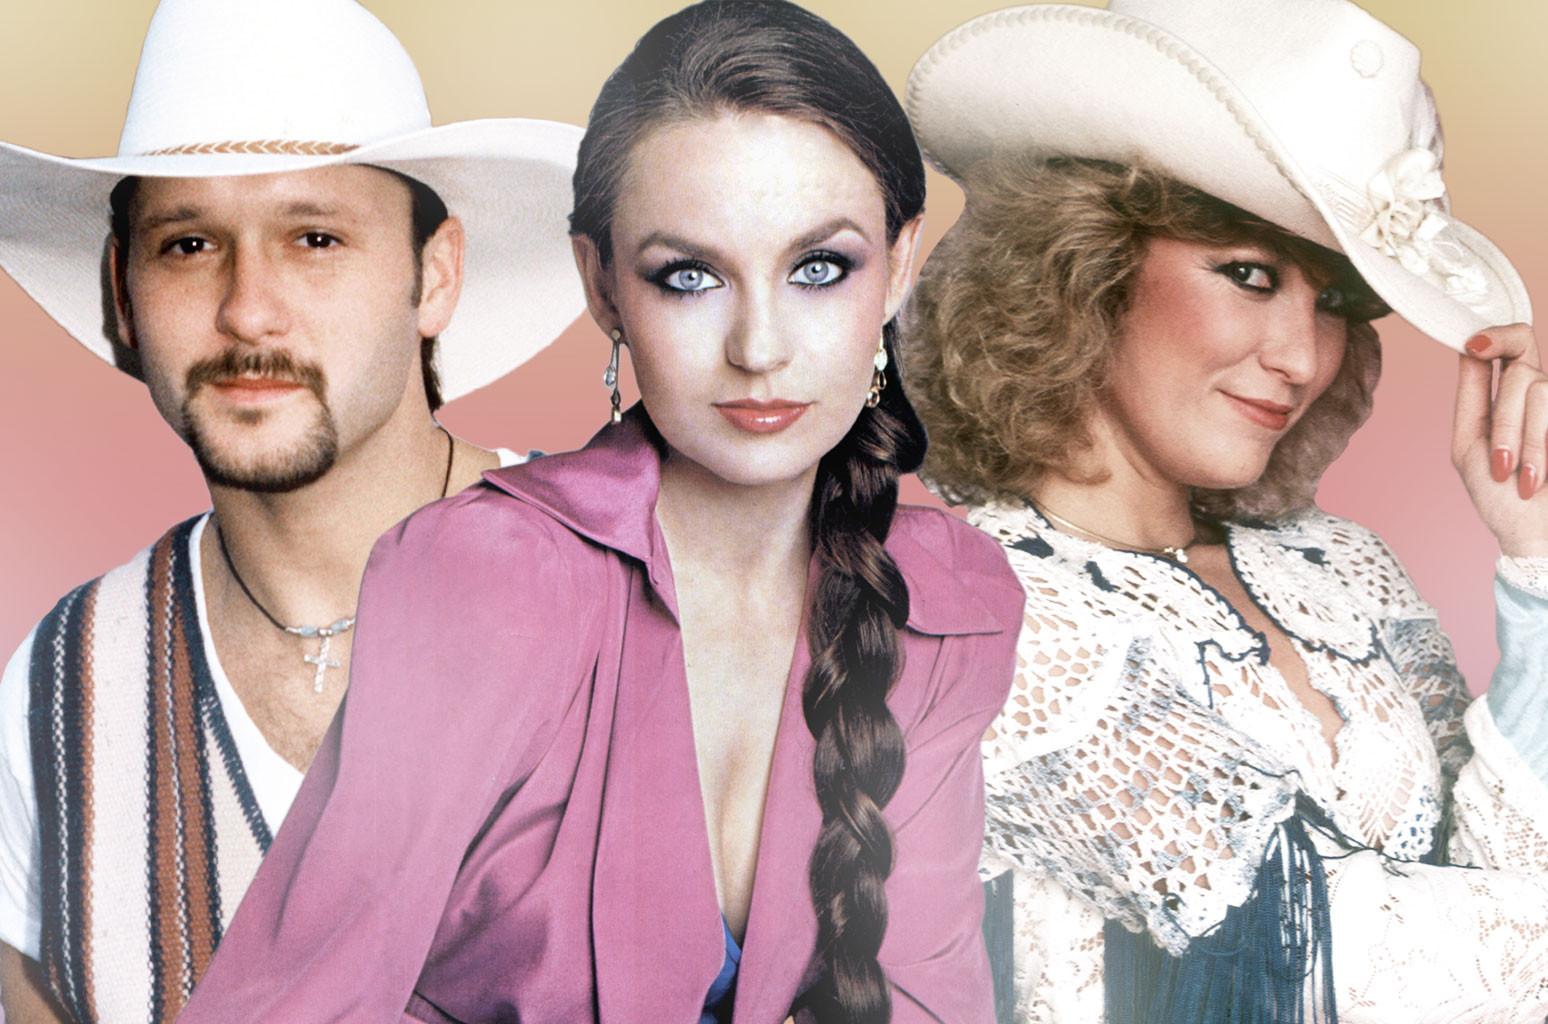 Tim McGraw, Crystal Gayle and Tanya Tucker